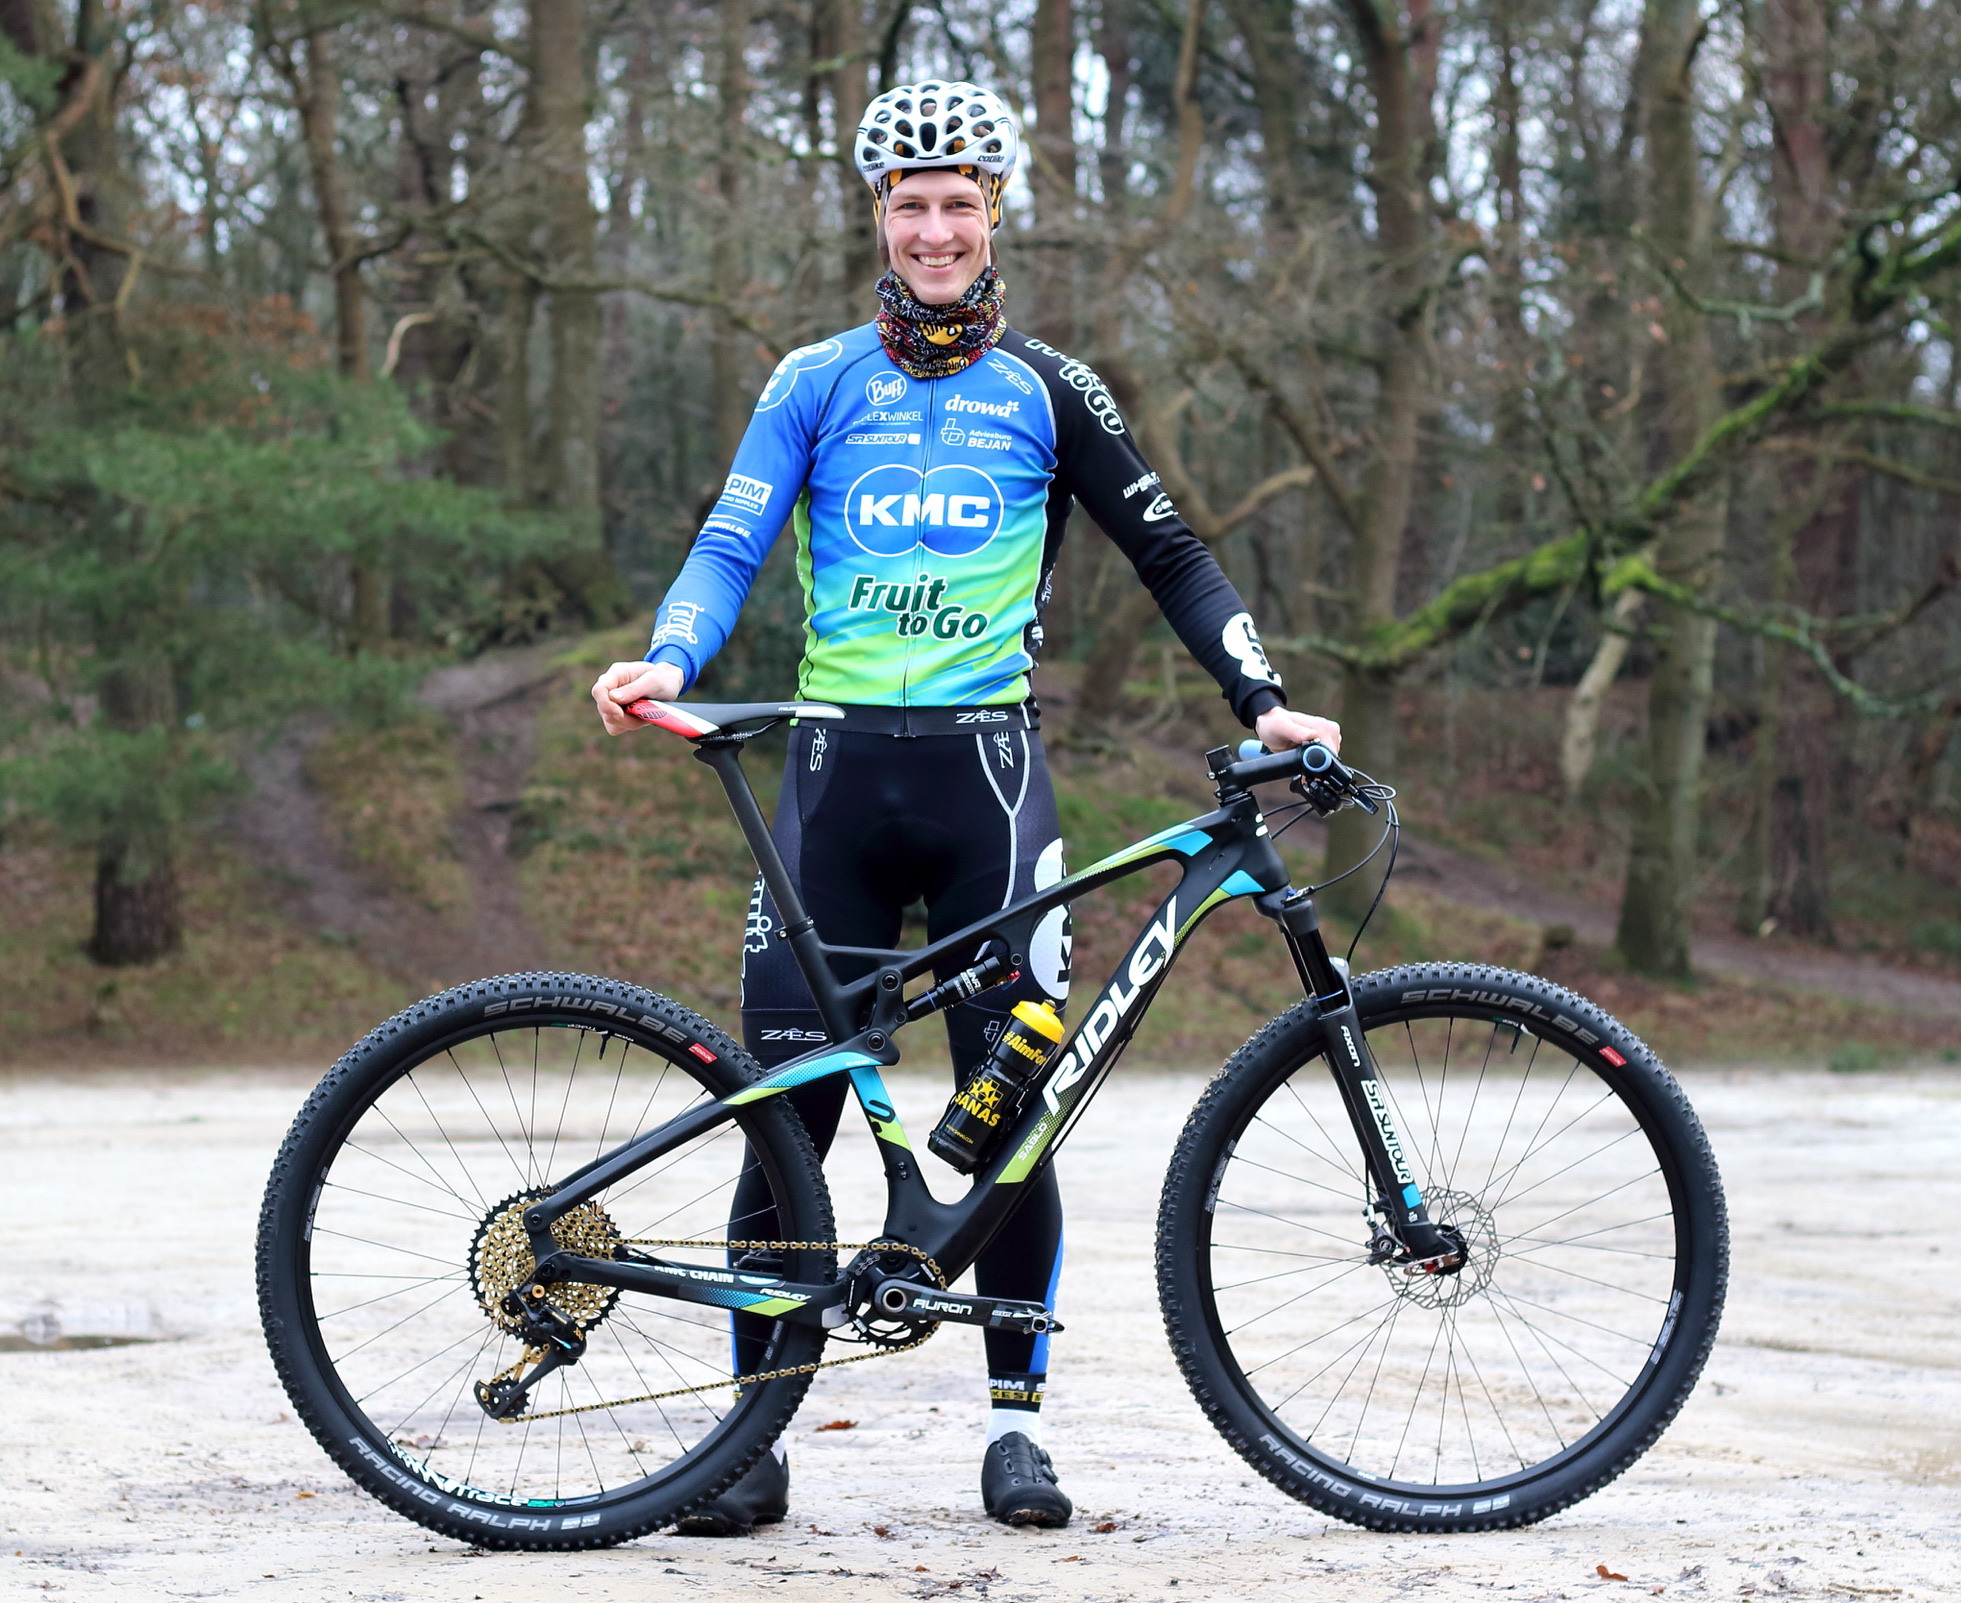 KMC-Fruit To Go team rijdt op Ridley mountainbikes dit seizoen